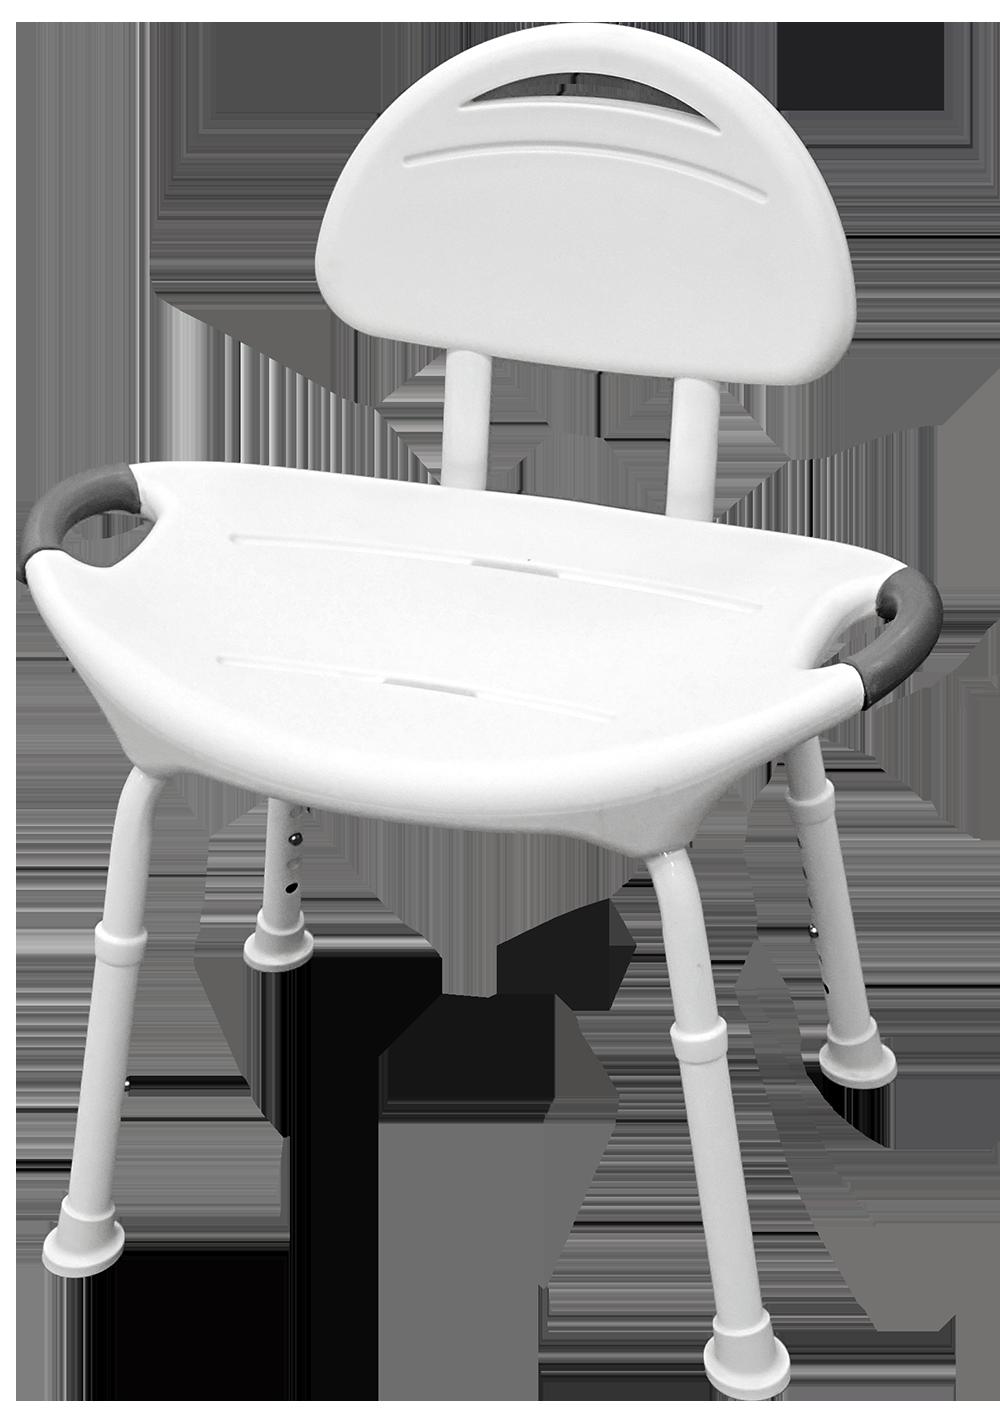 Tool Free Shower Chair - Shih Kuo Enterprise Co., Ltd.